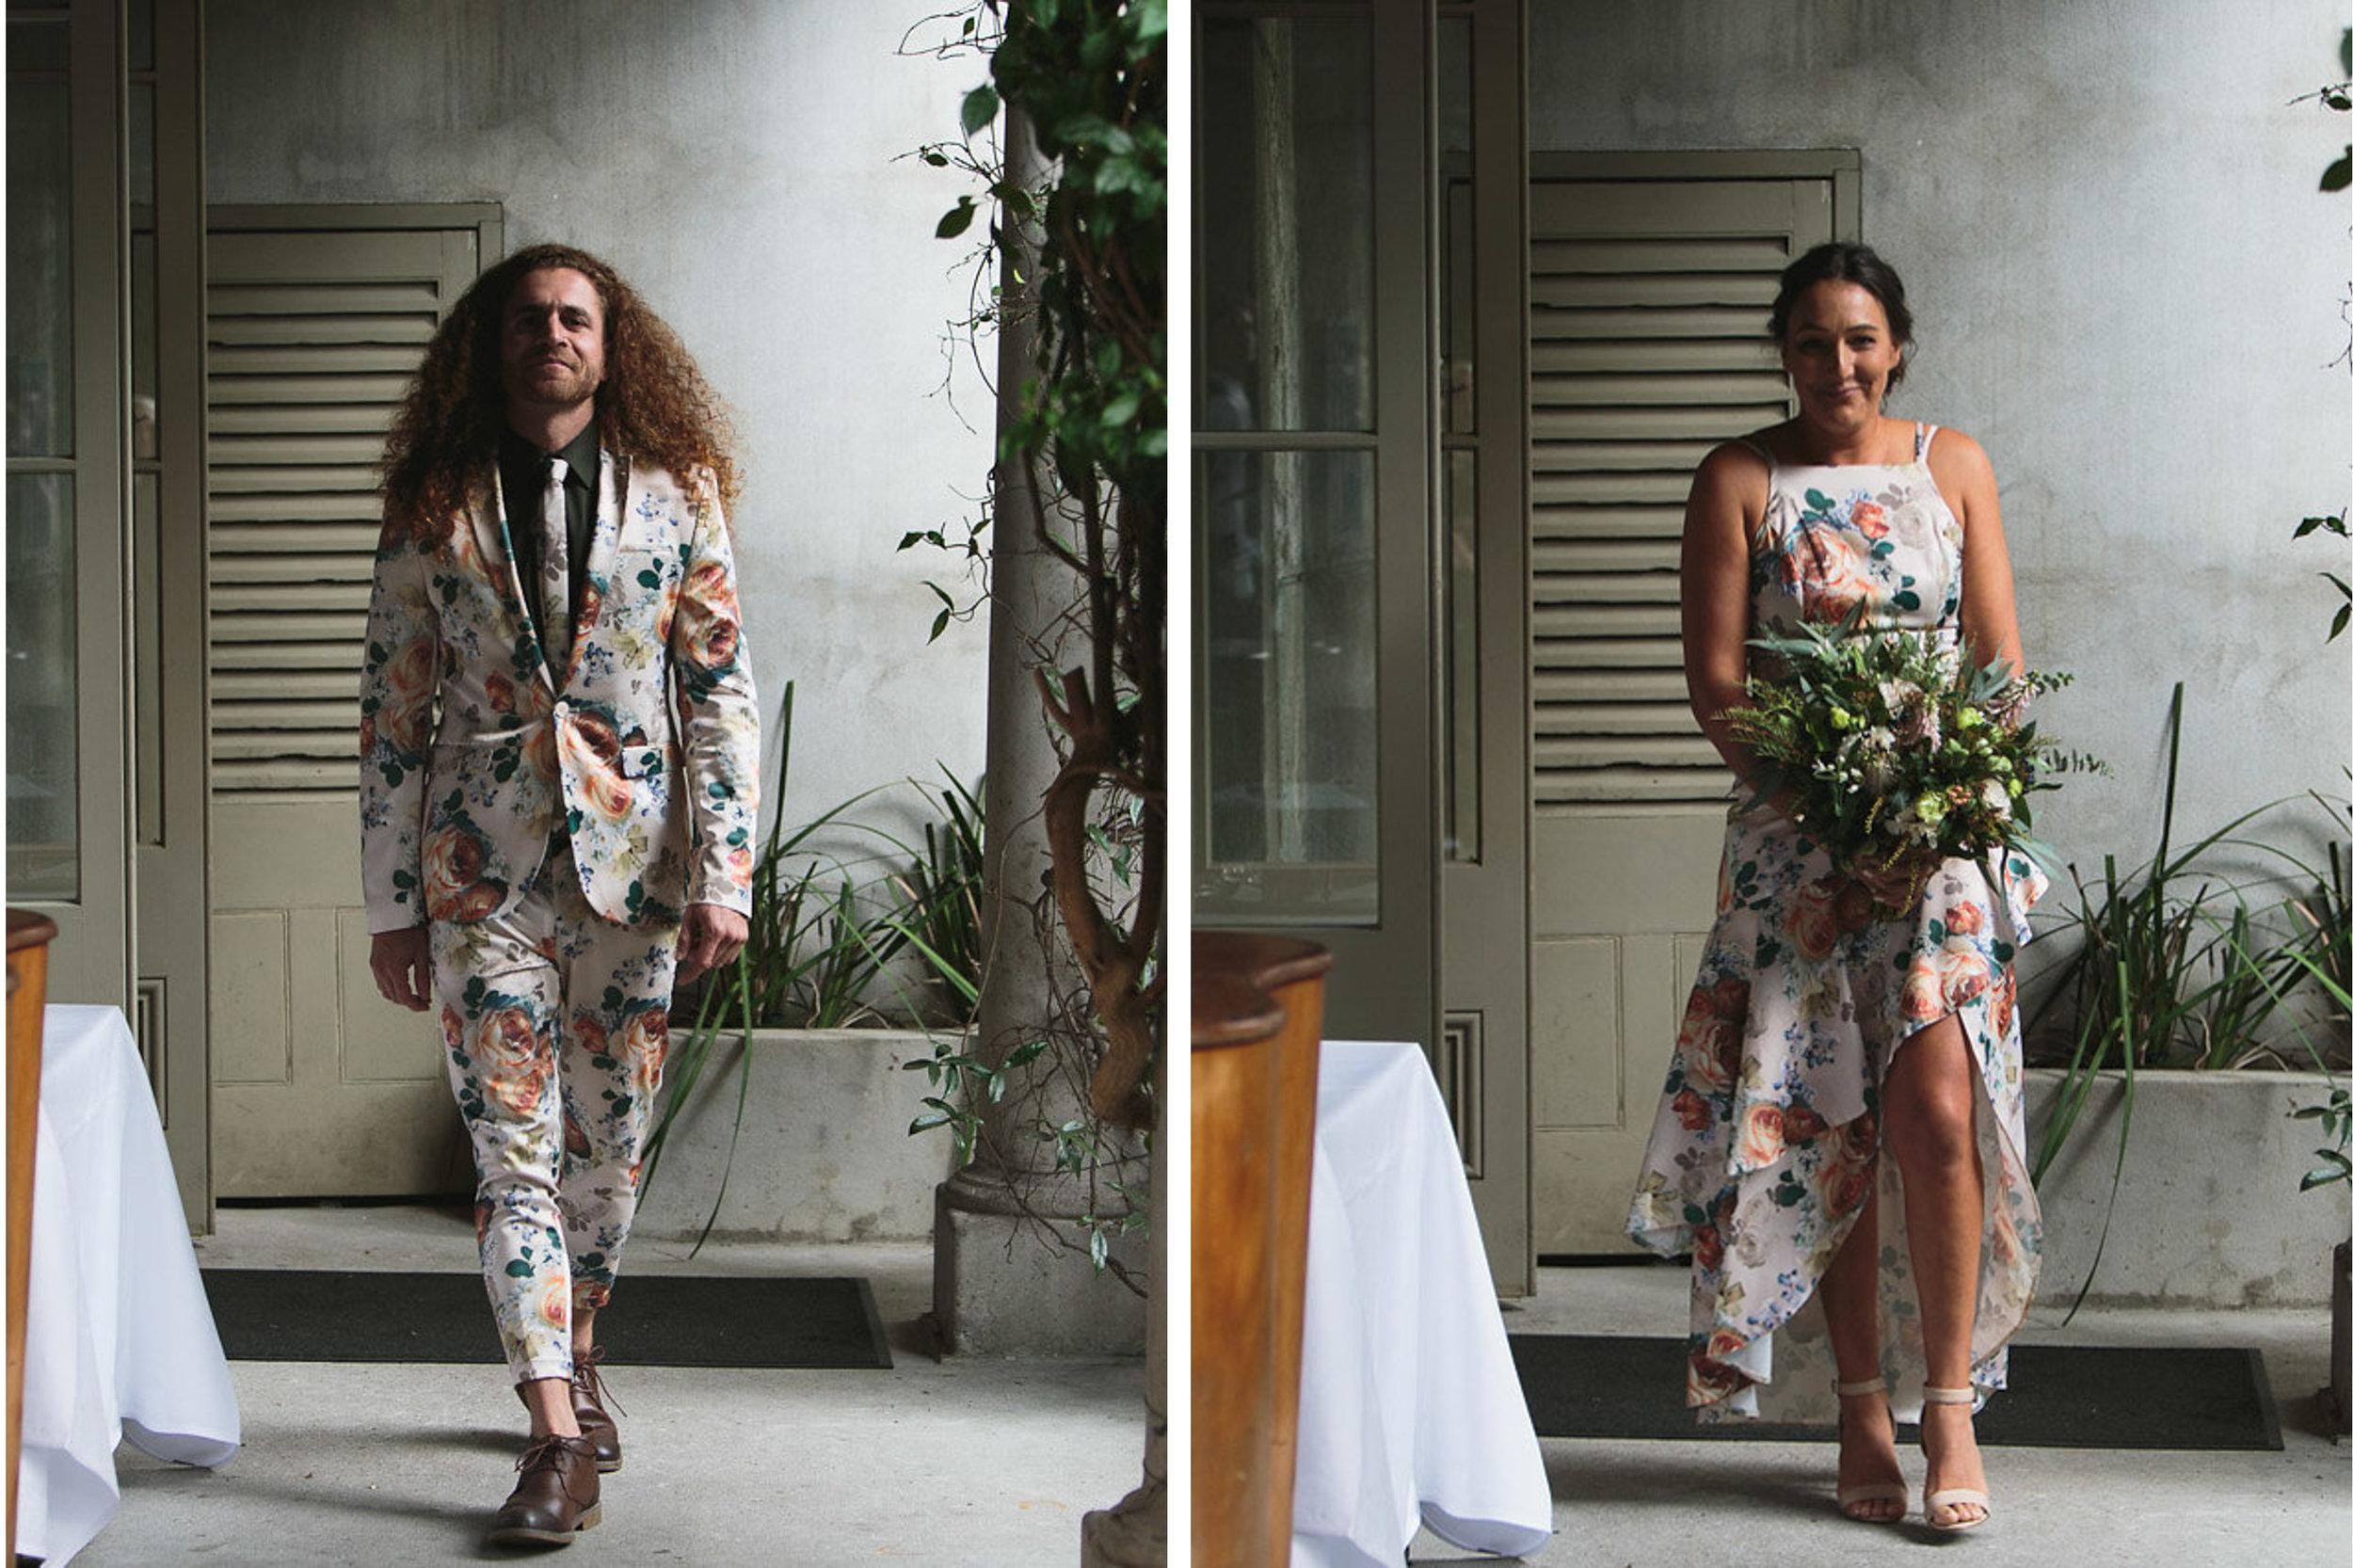 light-and-arrows-auckland-urban-wedding-blog-65.jpg